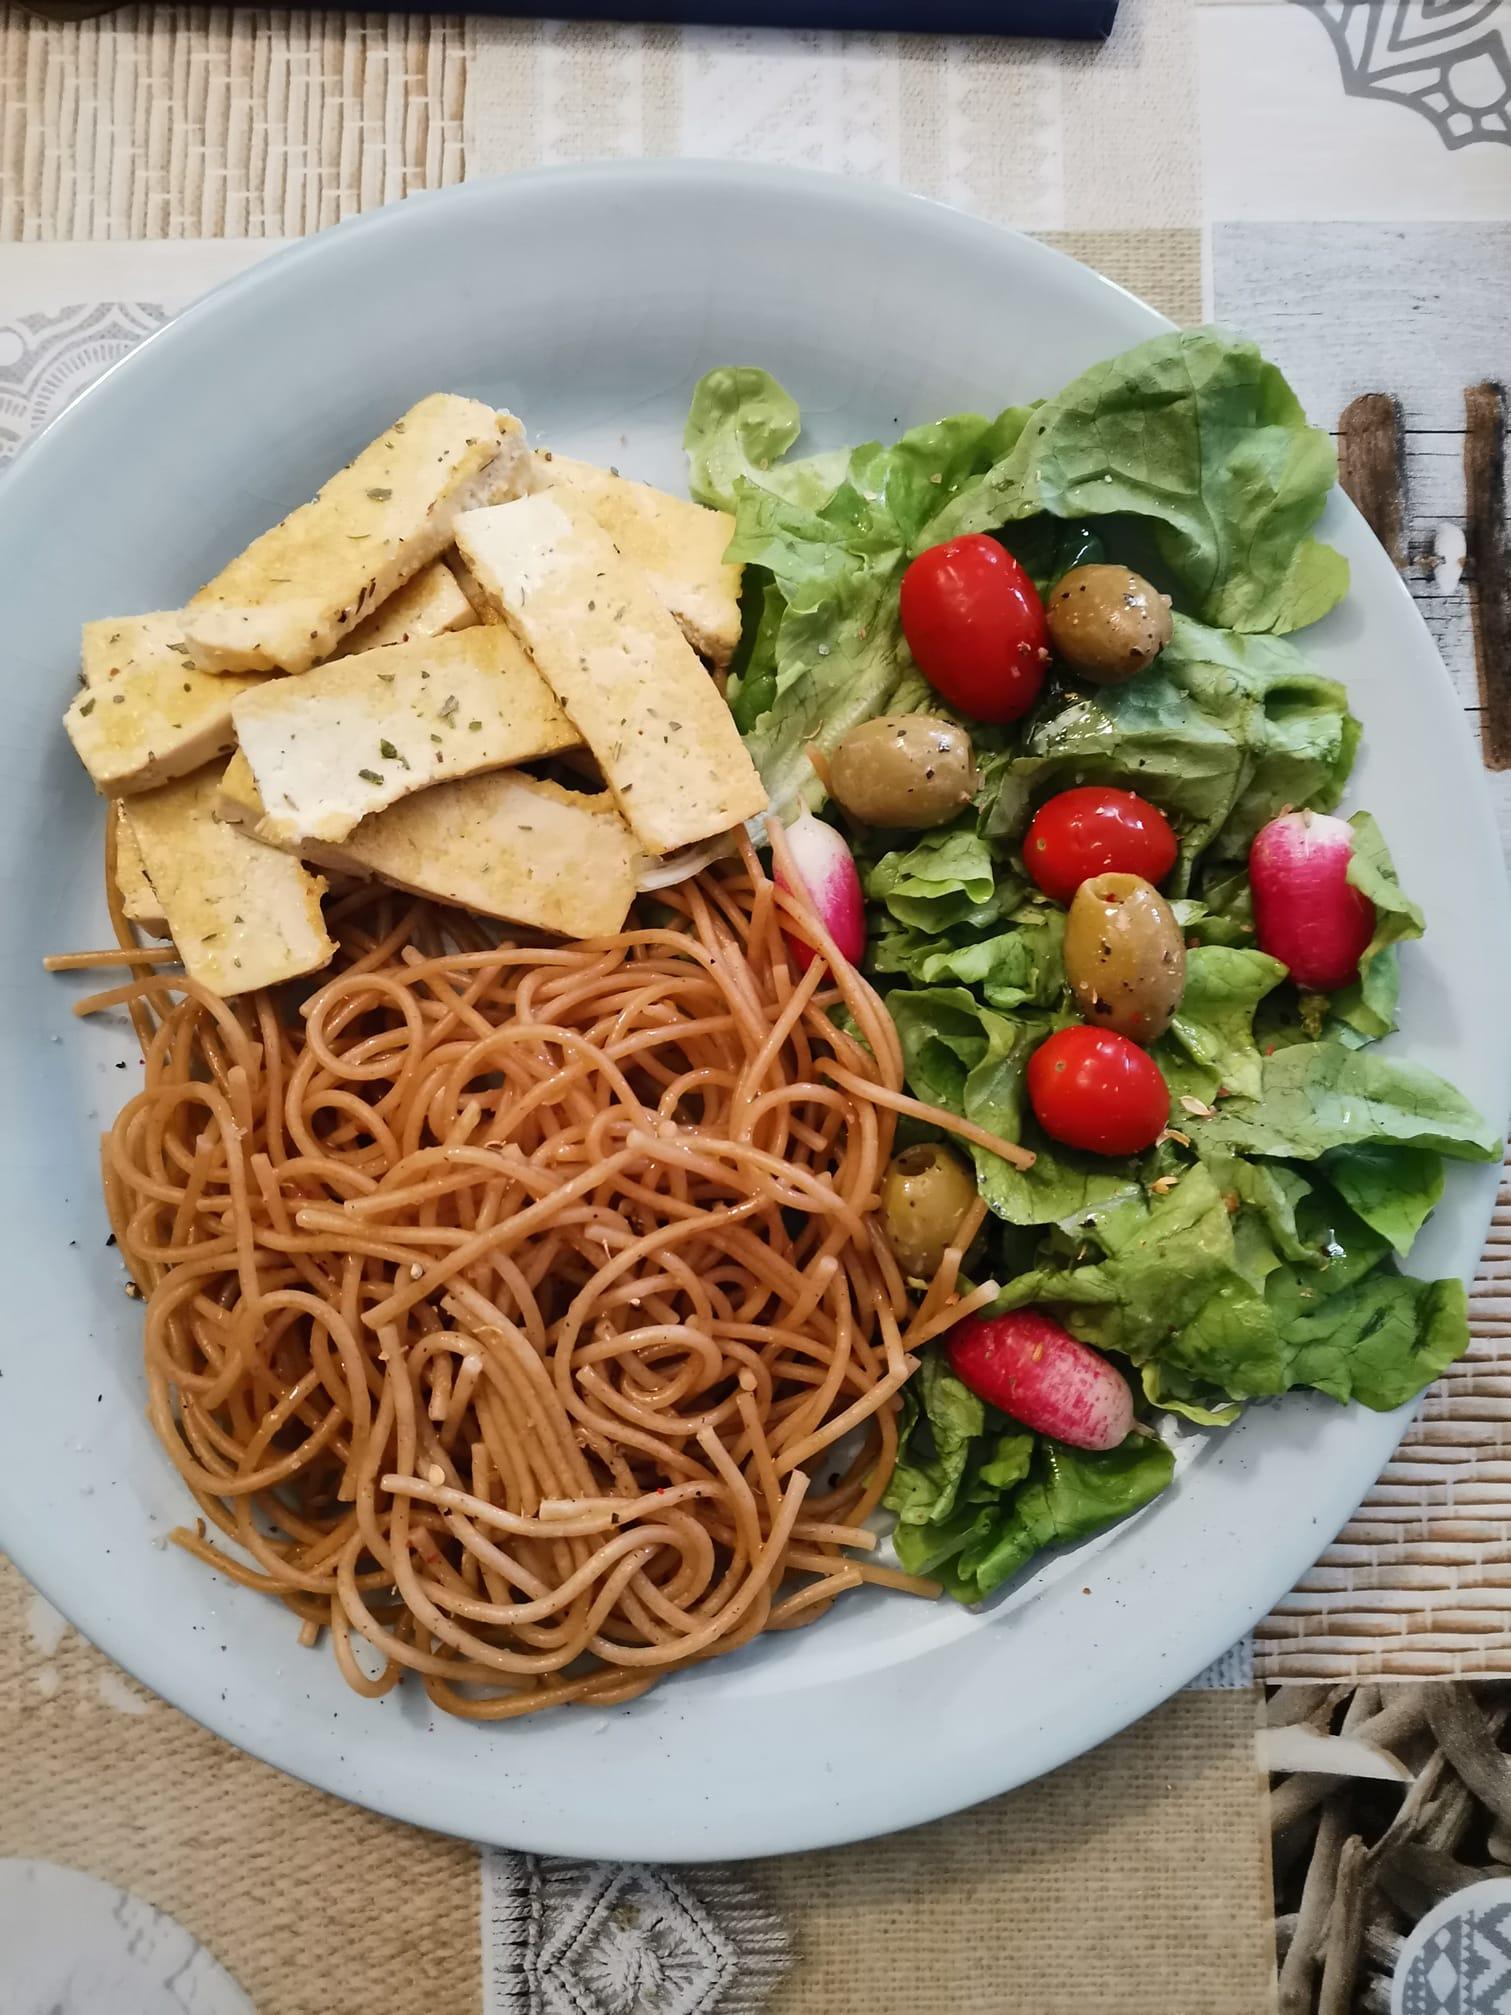 Exemple repas prise de masse saine